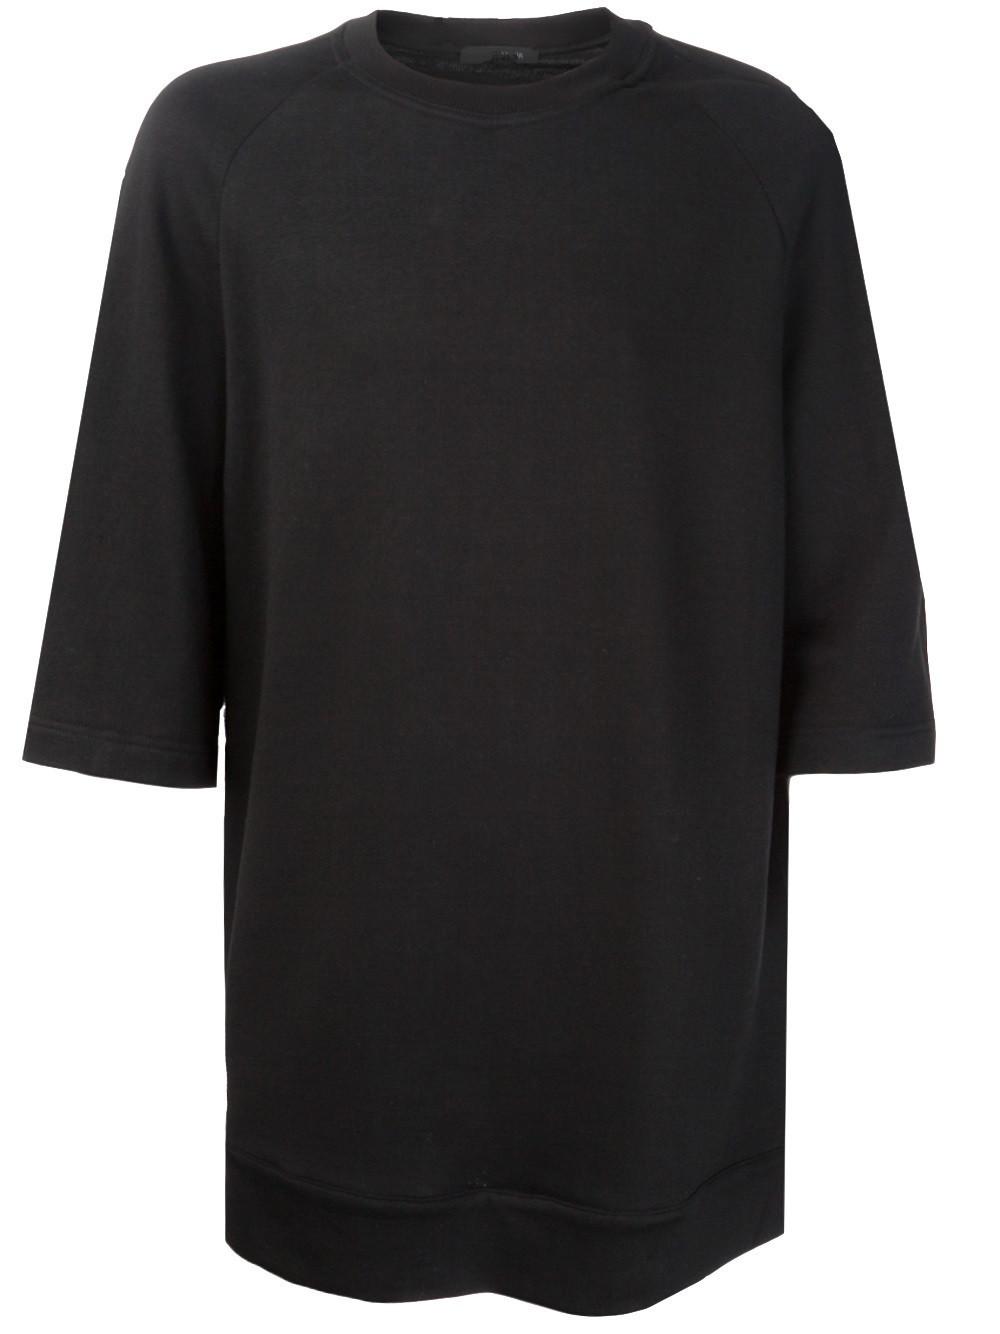 Black t shirt blank - Men S Black Blank Elongated T Shirt Mens Tall Tee